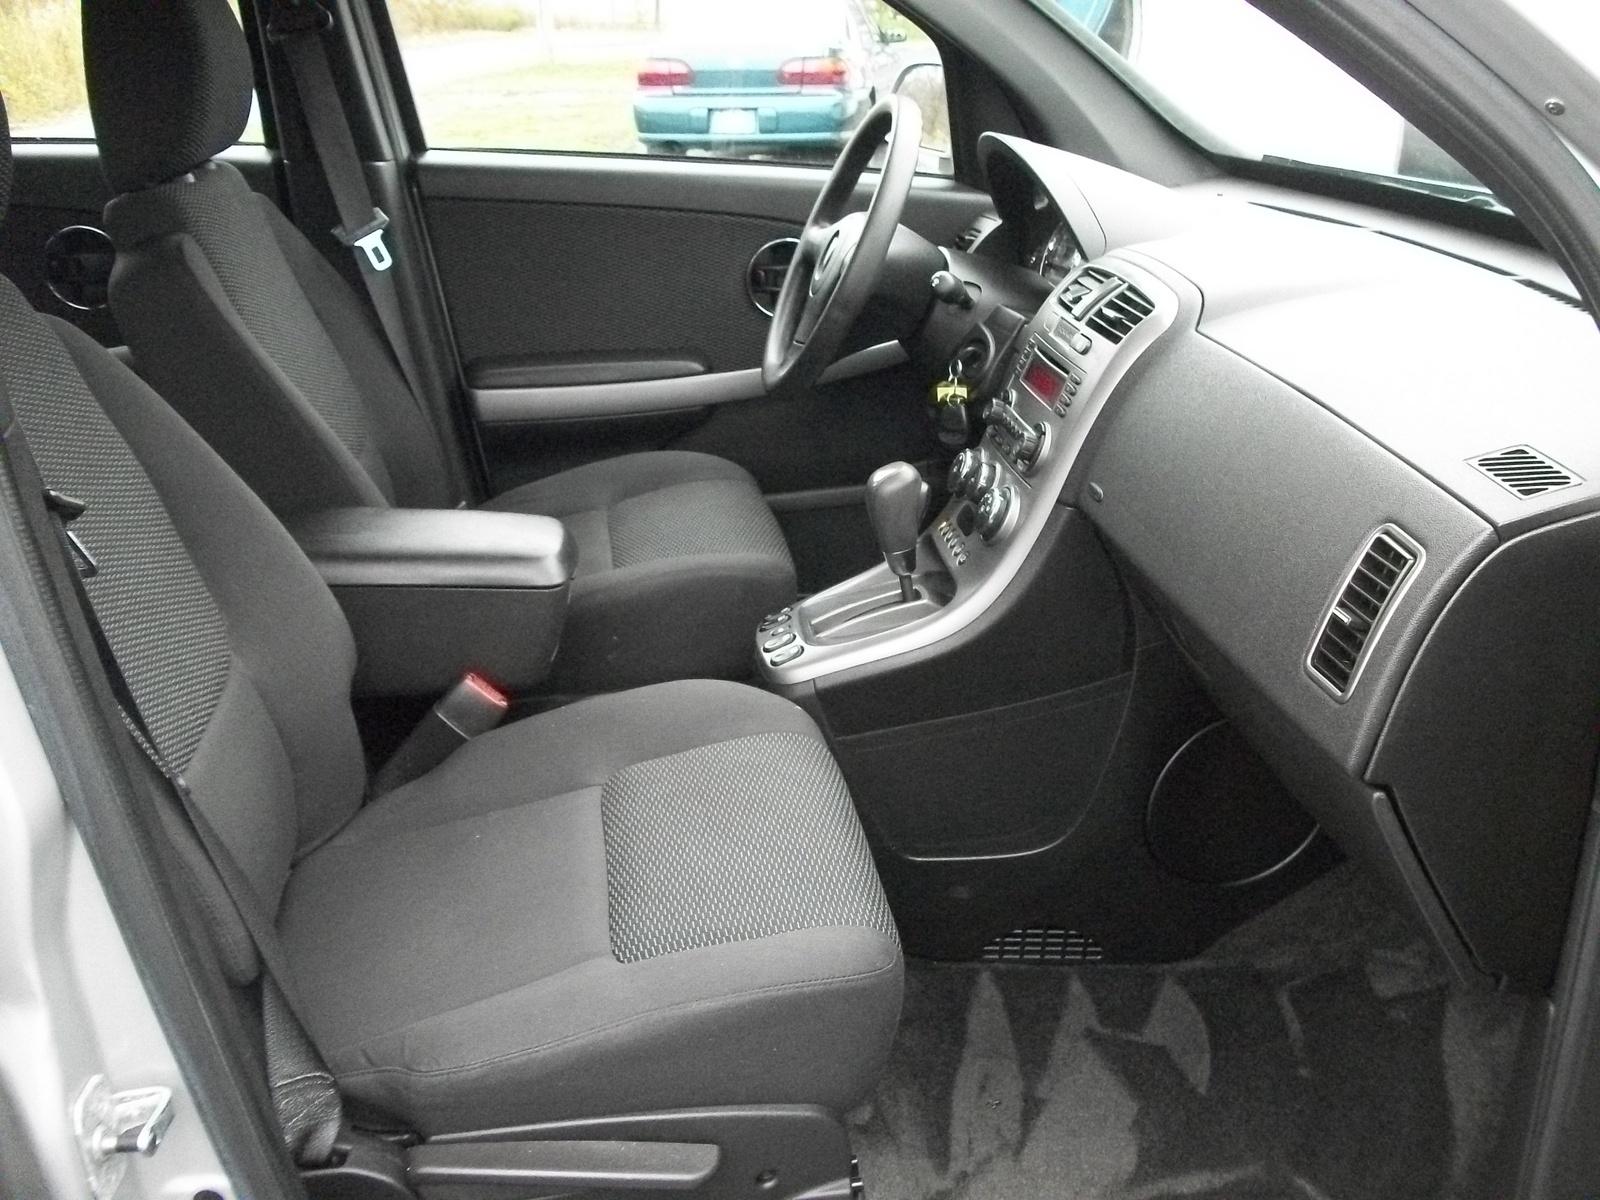 2006 Pontiac Torrent Image 18